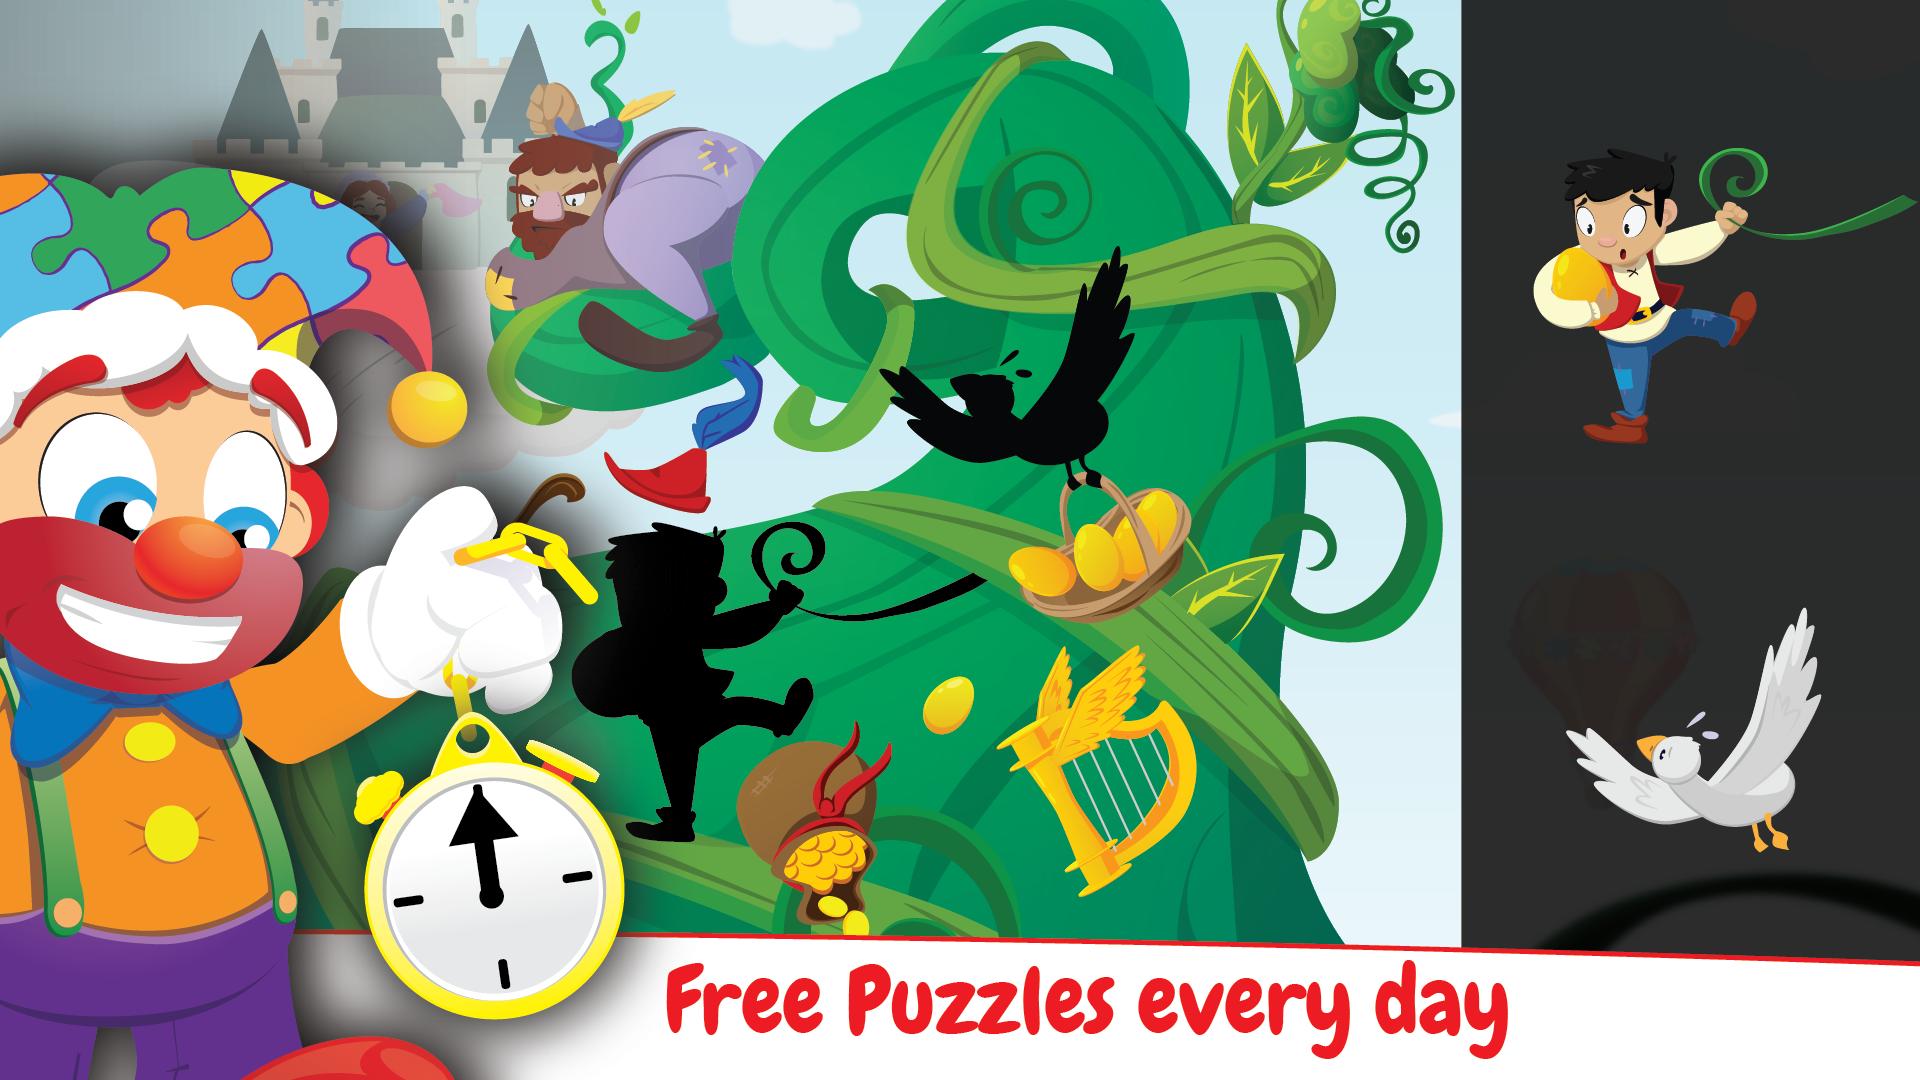 Puzzingo Puzzles App #Puzzingo #Puzzles #app #technology #ad